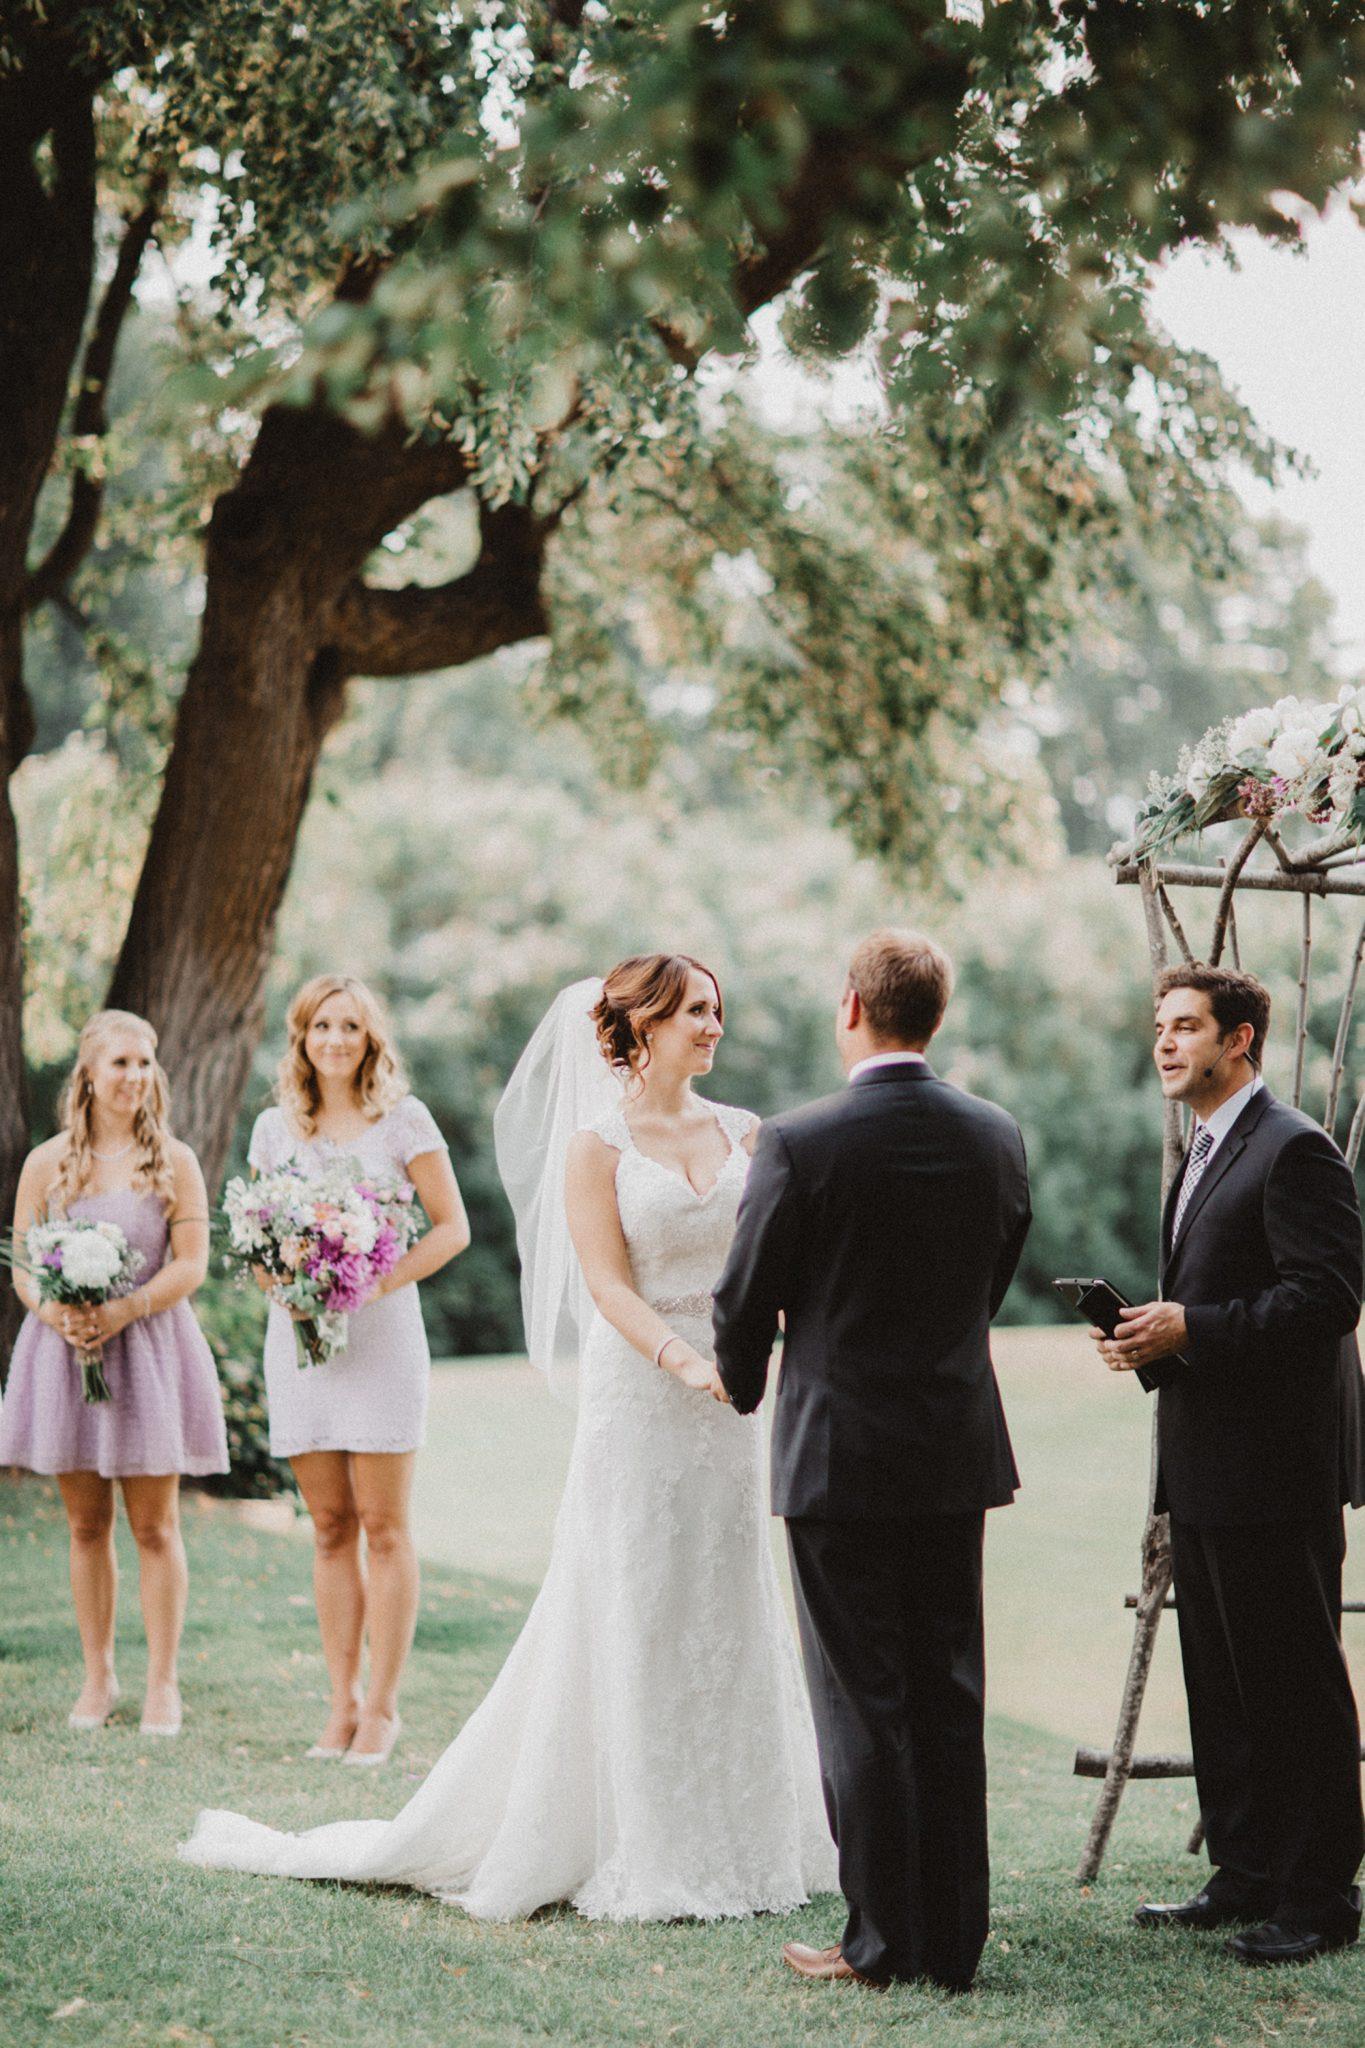 457-vernon-wedding-photographer